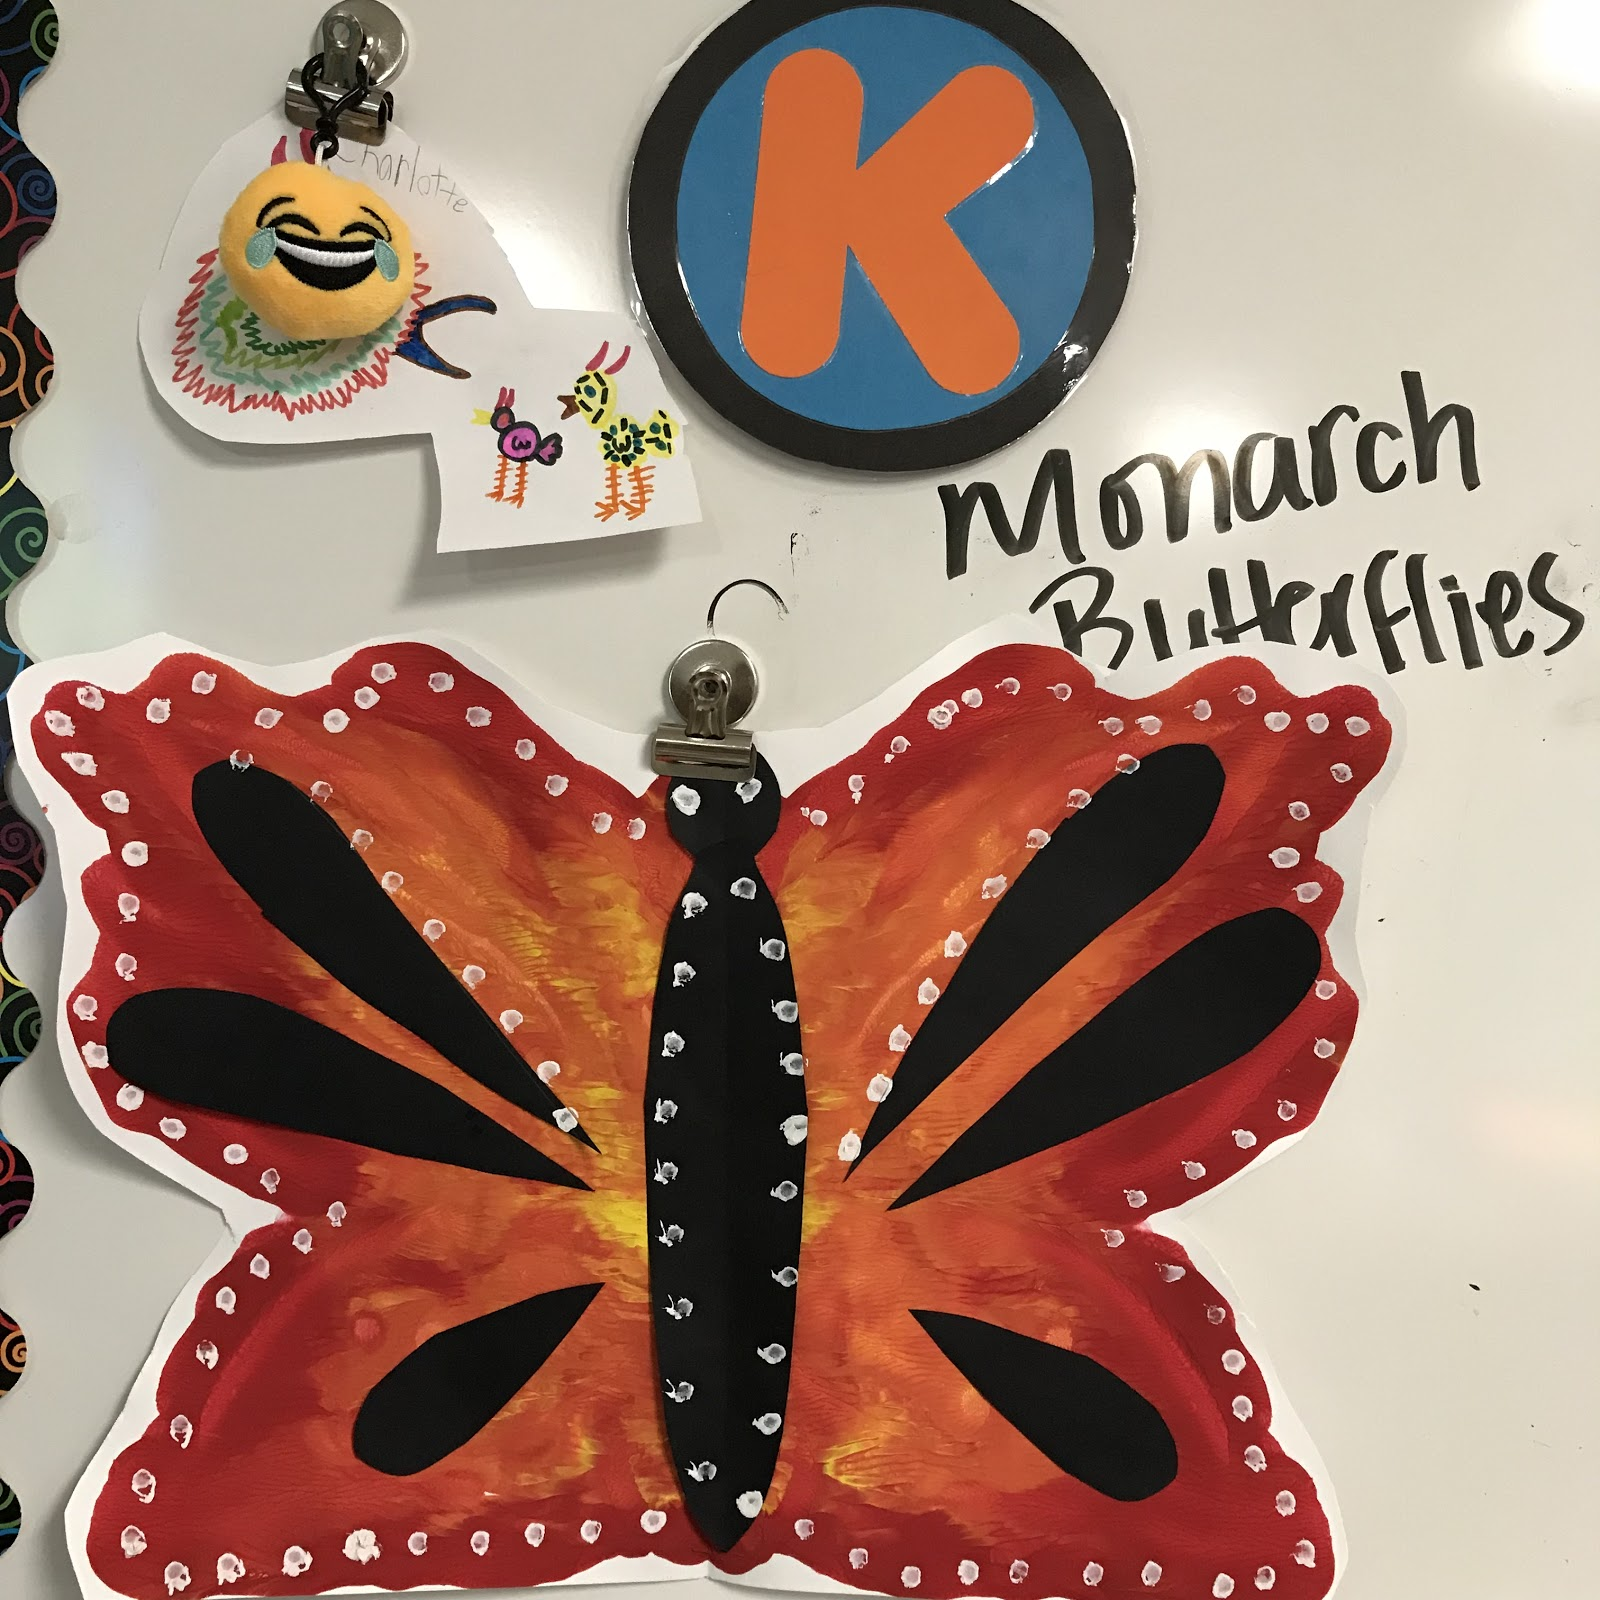 Elements Of The Art Room Kindergarten Symmetrical Monarch